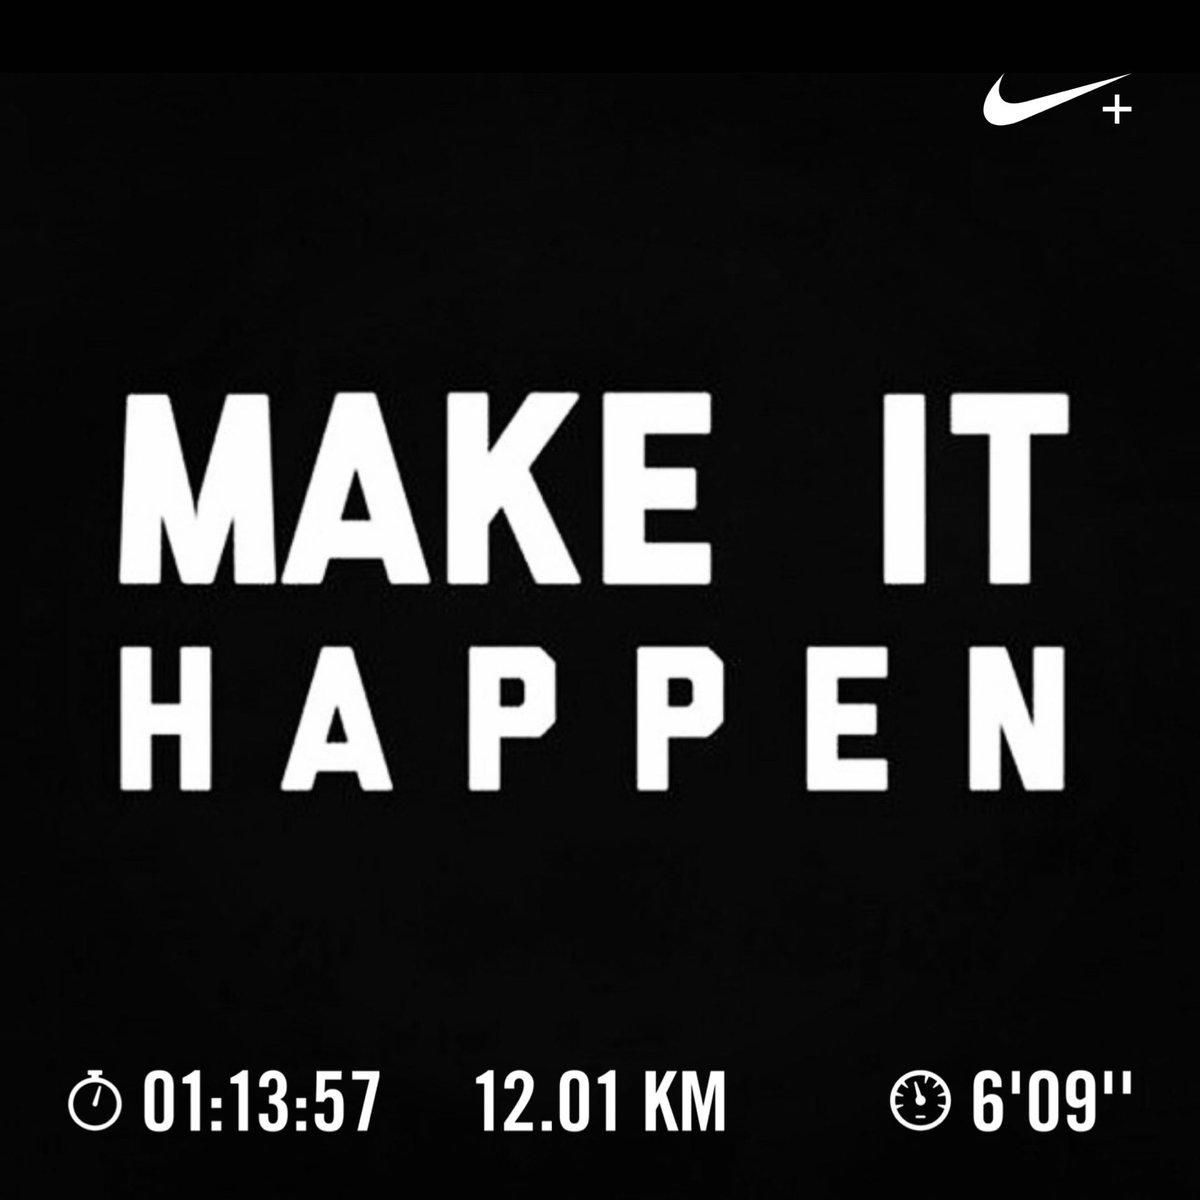 #MakeItHappen #runnerlife pic.twitter.com/YnmLcoNcsf